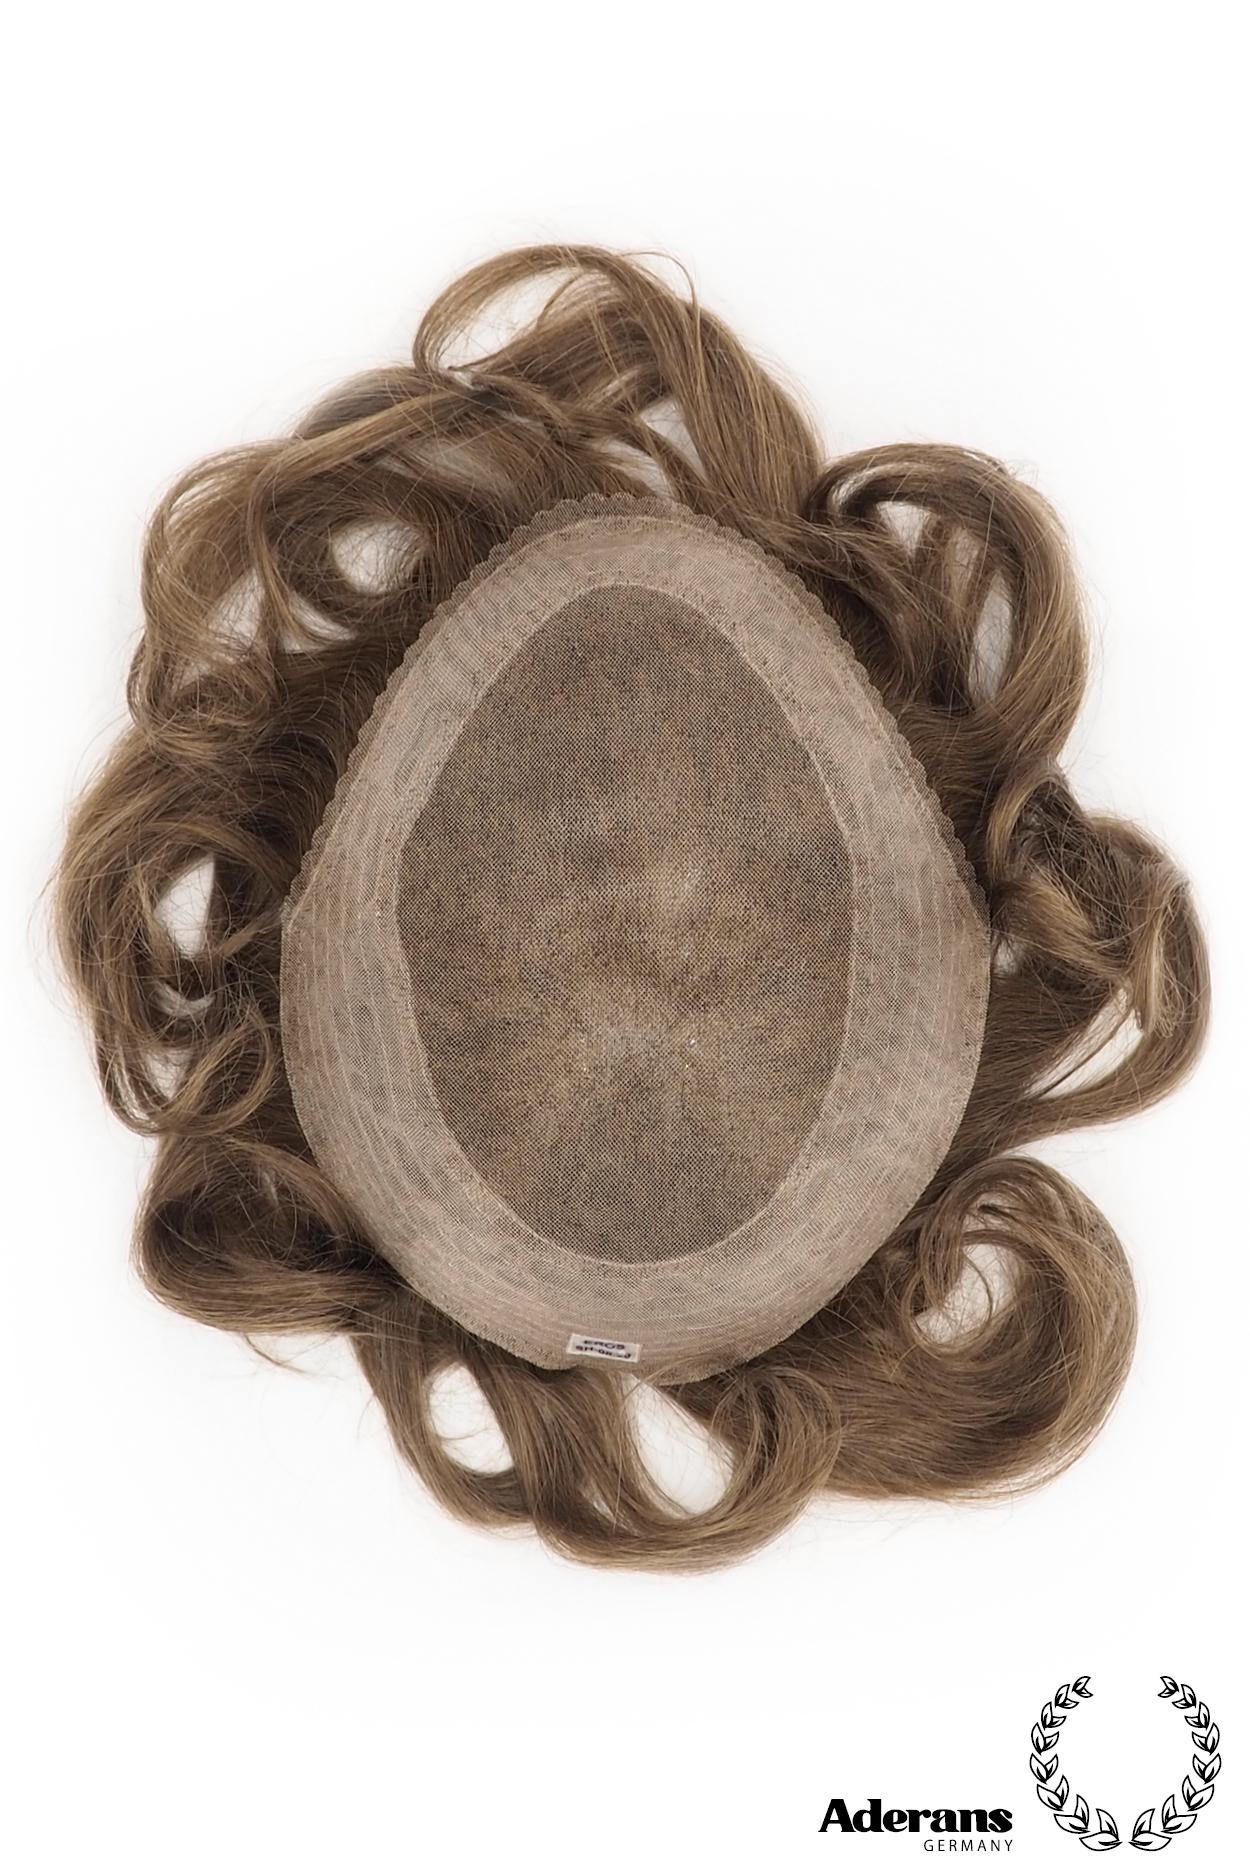 Echthaar Haarteil